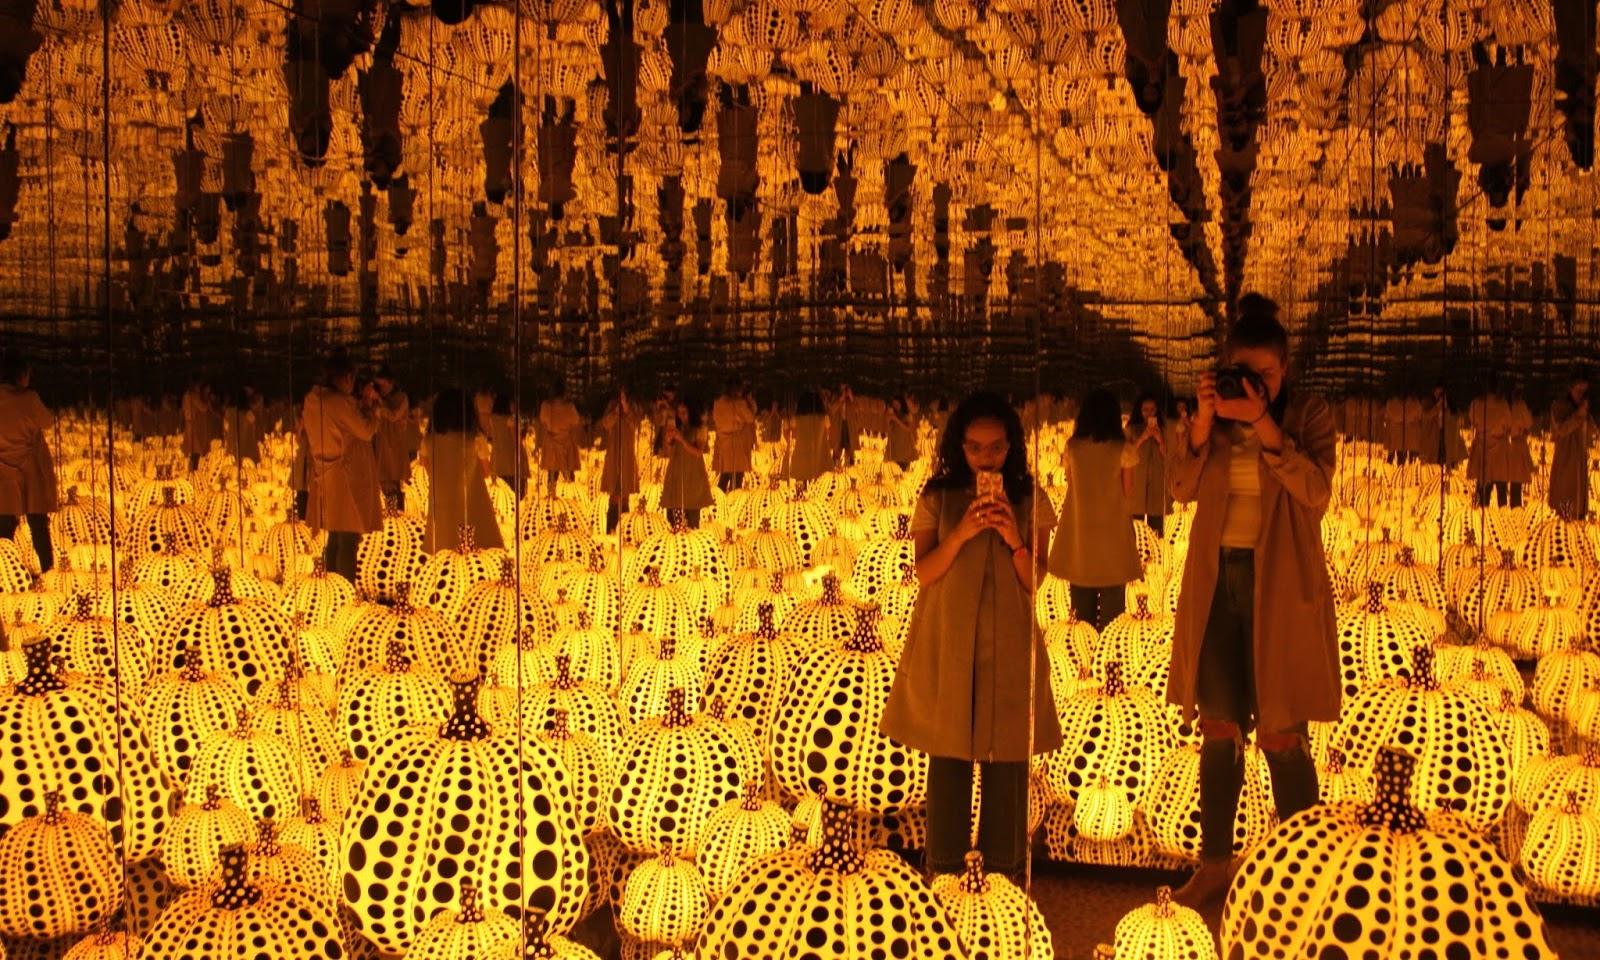 Yayoi Kusama: Sculptures, Paintings & Mirror Rooms